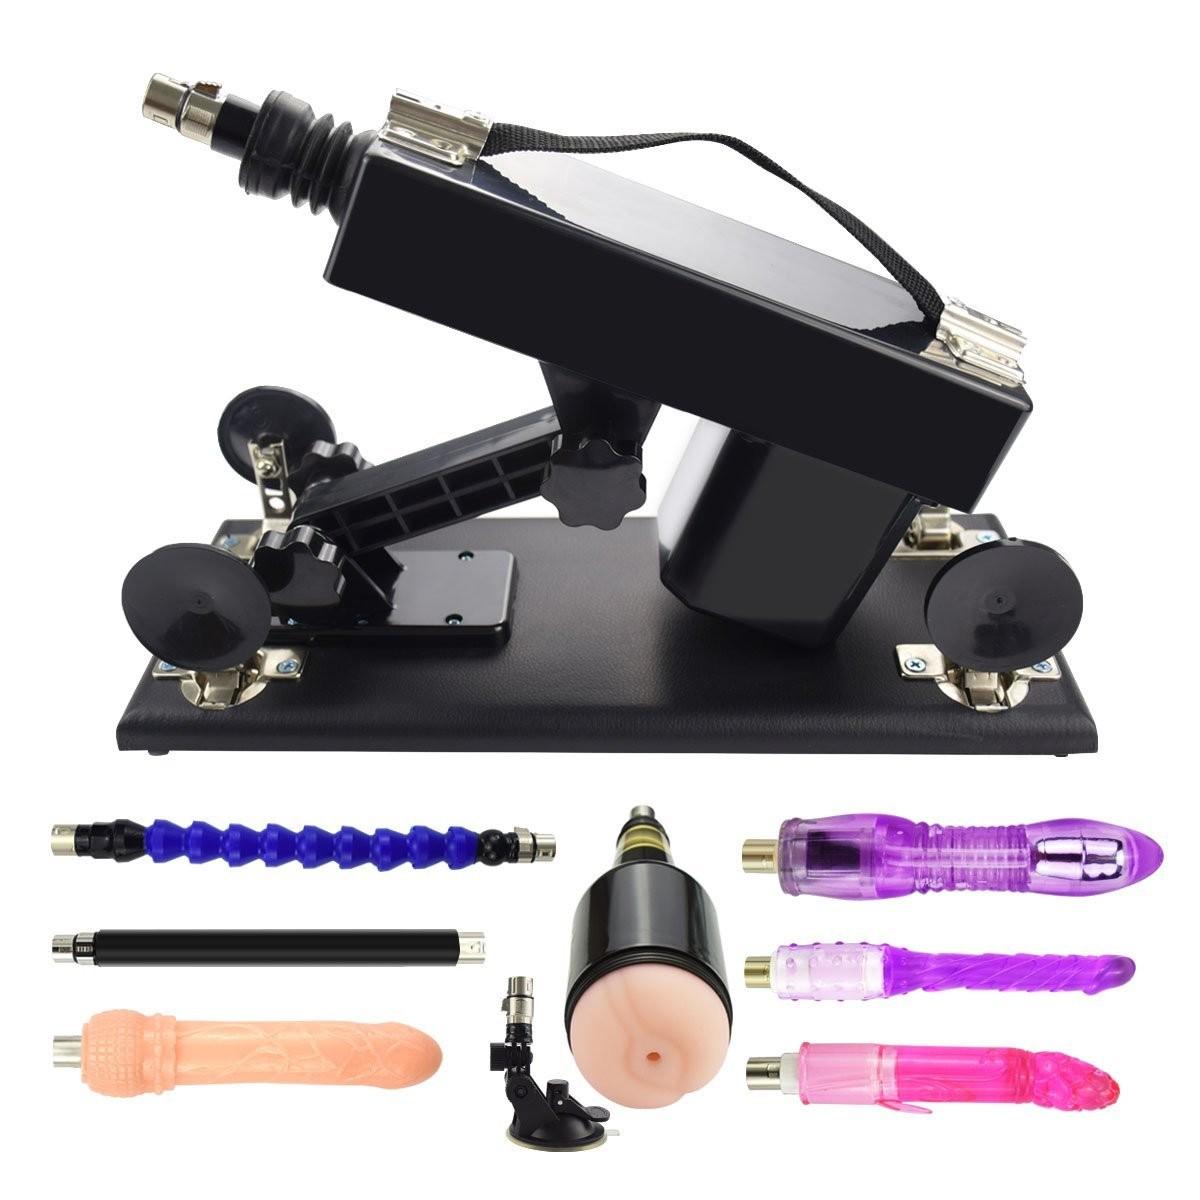 Multi-Speed Adjustable Pumping & Thrusting Sex Machine Device